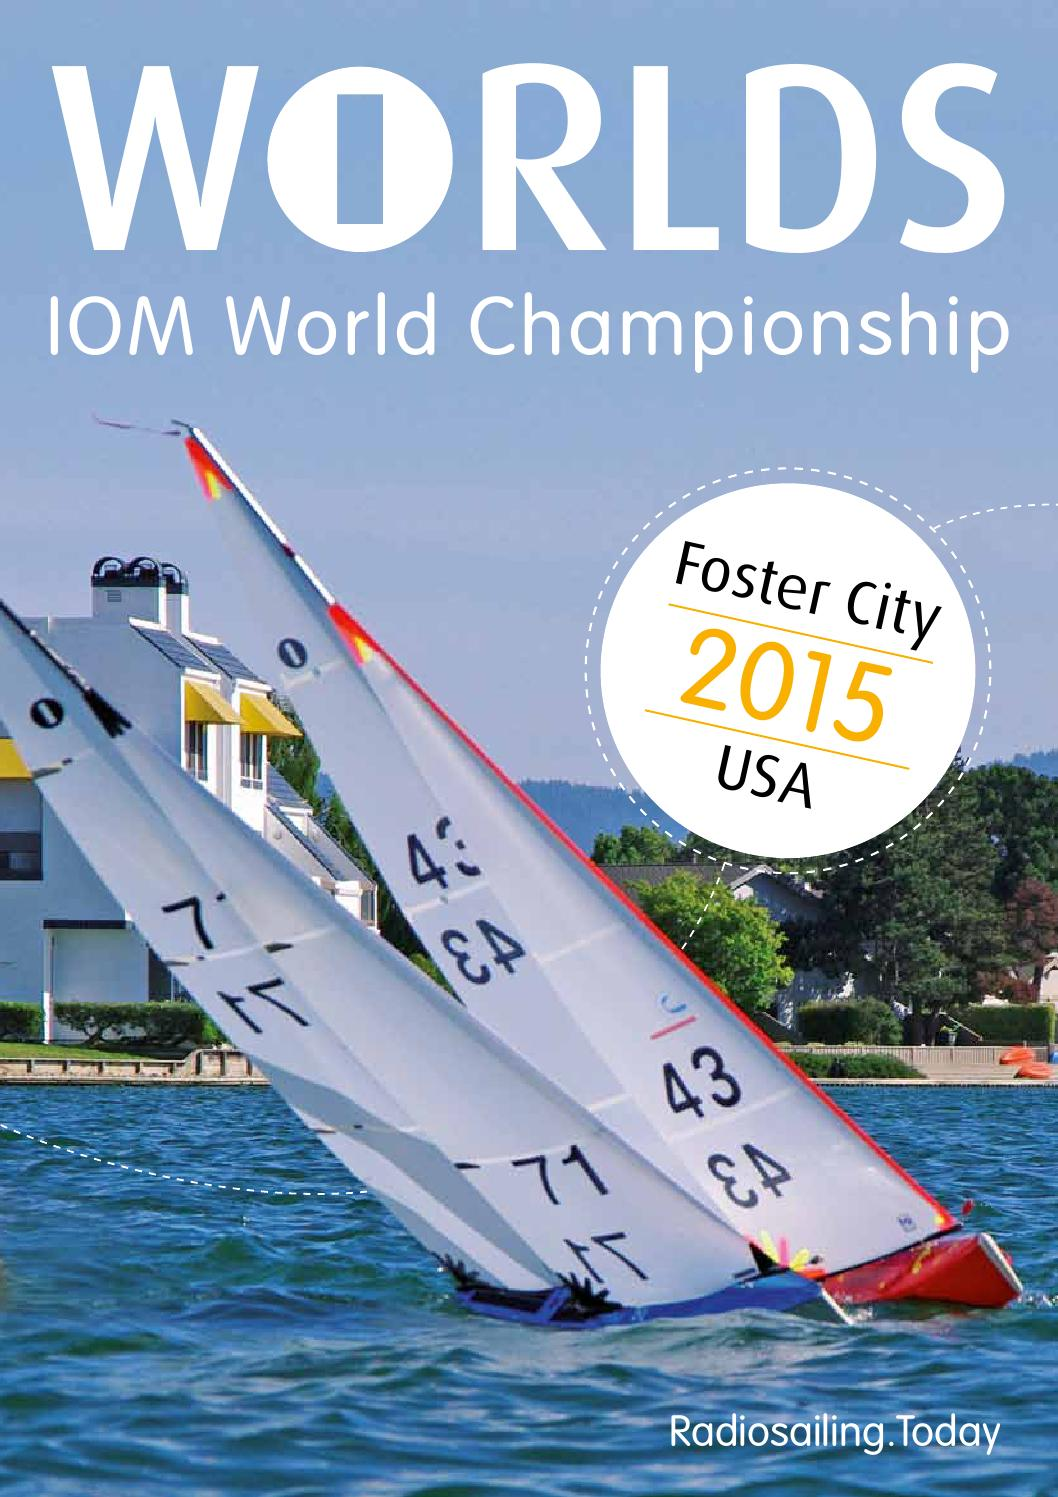 IOM Worlds Magazine by RadioSailing Today - issuu